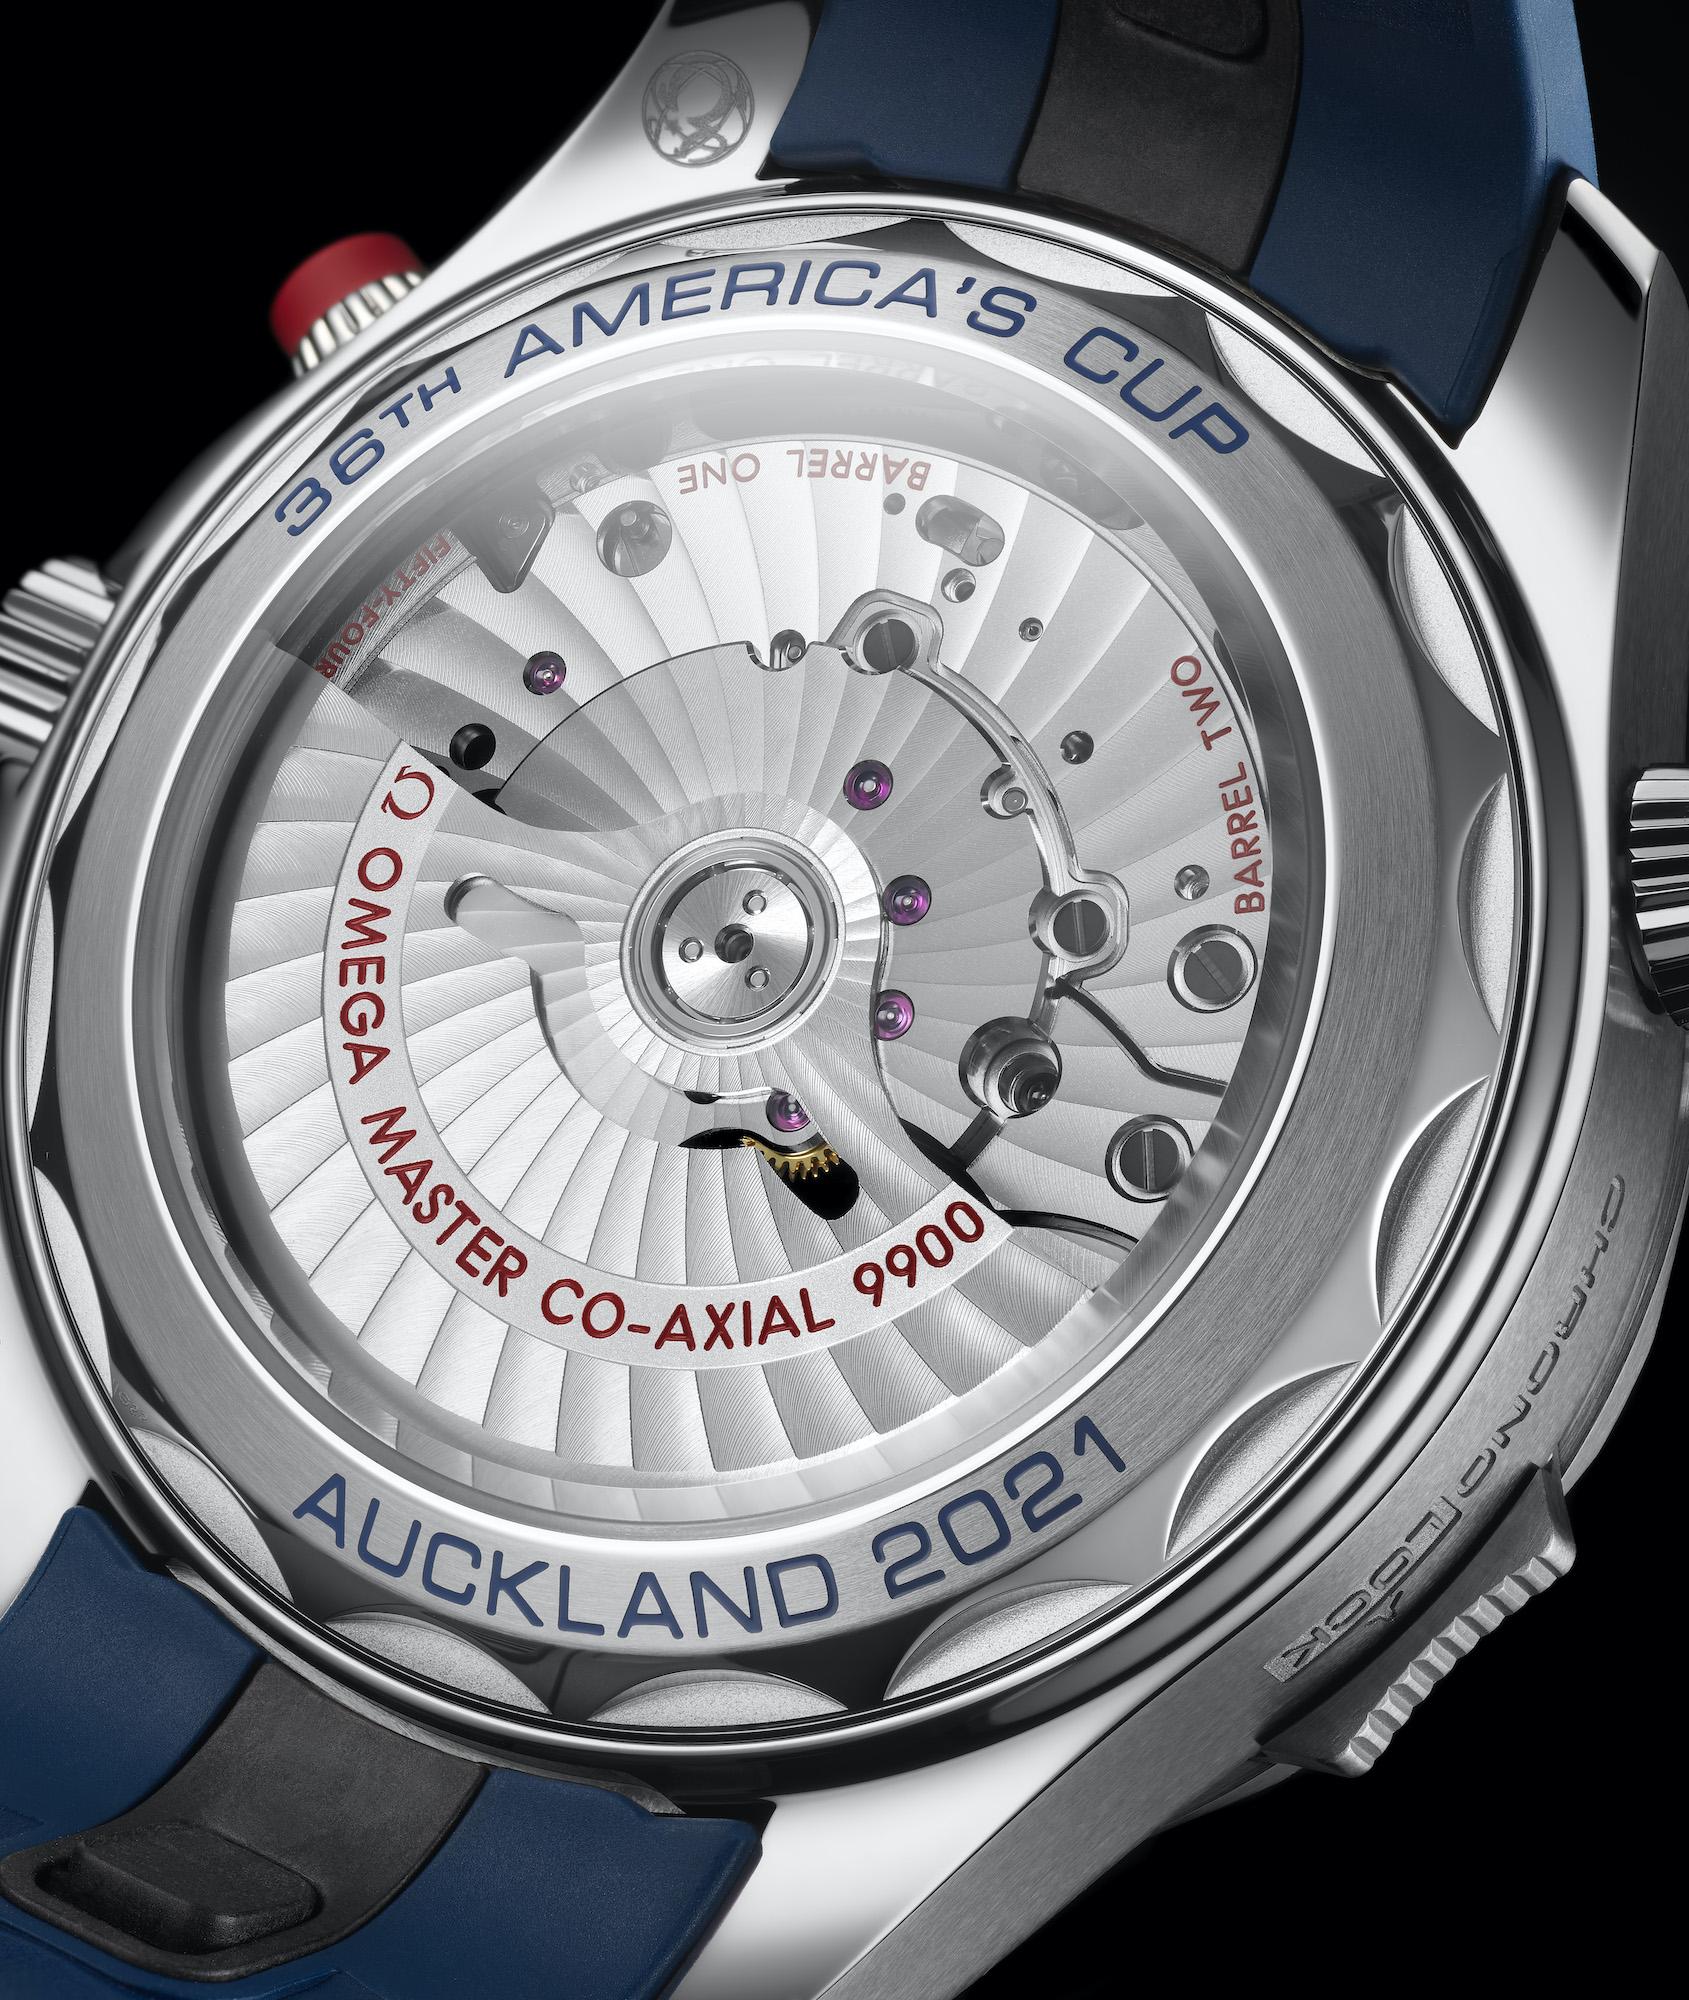 Omega Seamaster Diver 300M Americas Cup Chronograph 210.30.44.51.03.002 Detalle trasera